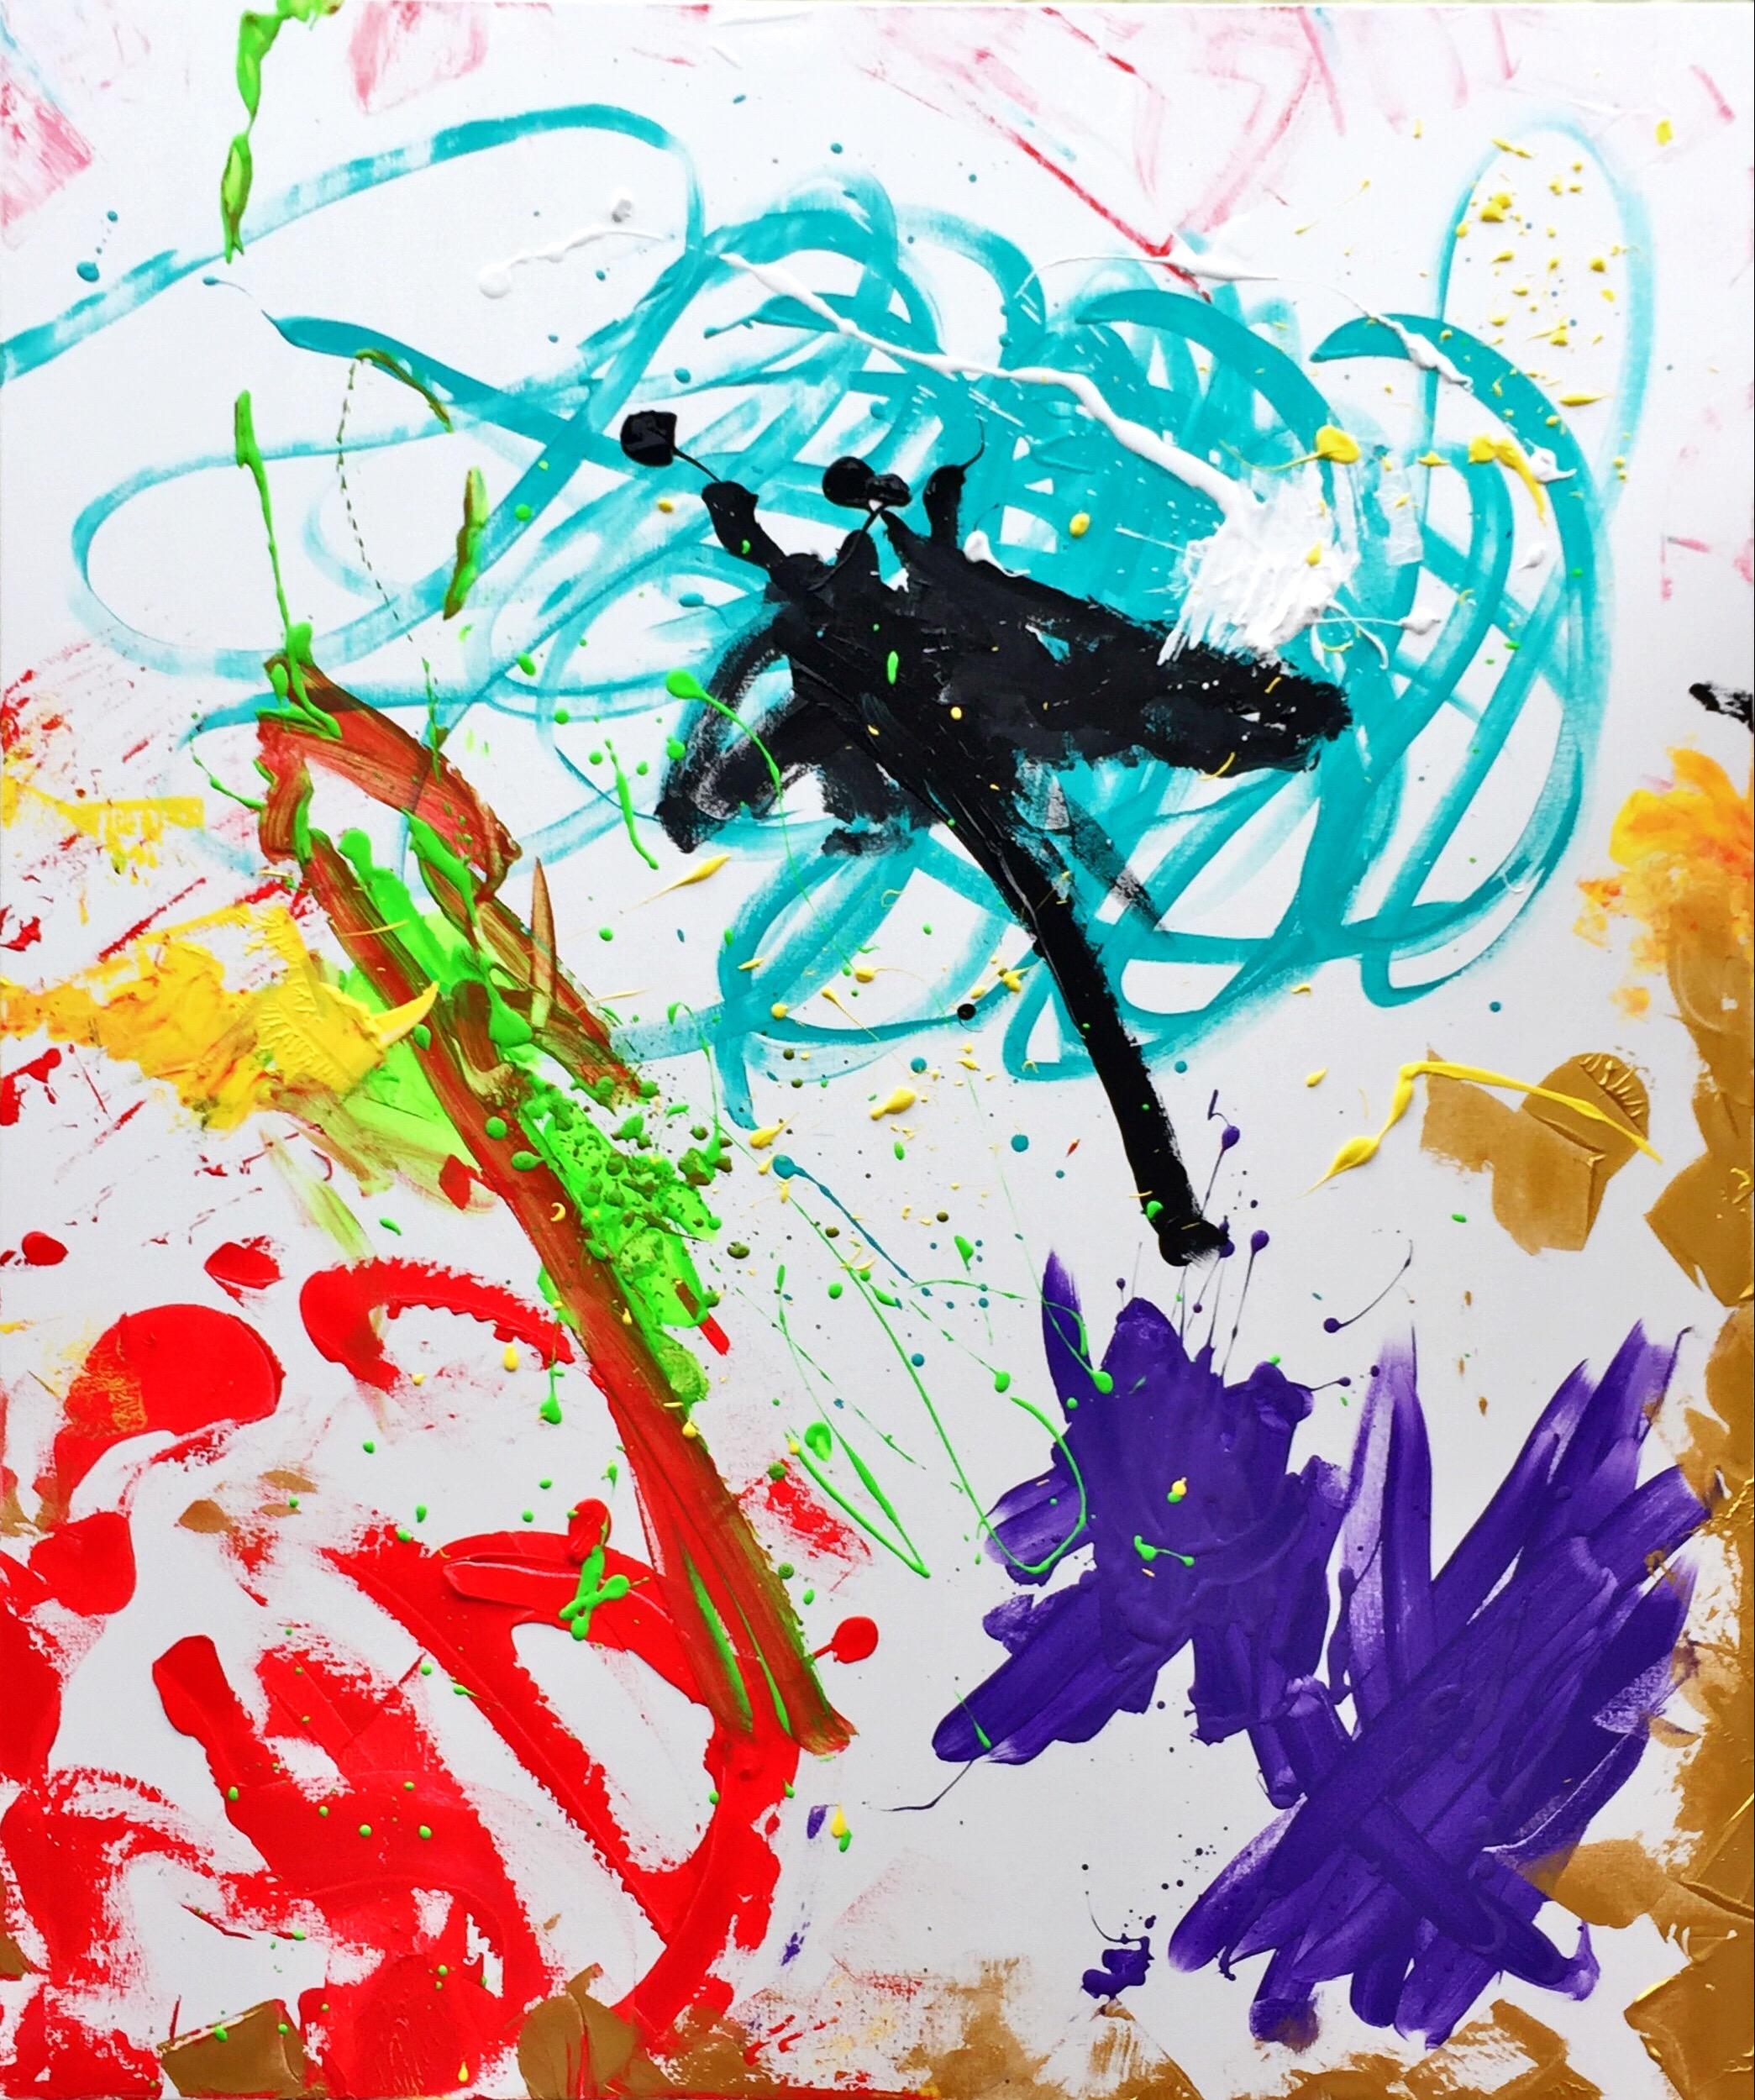 SoulArtist Acryl Malerei Bild auf Leinwand Julia Merkt